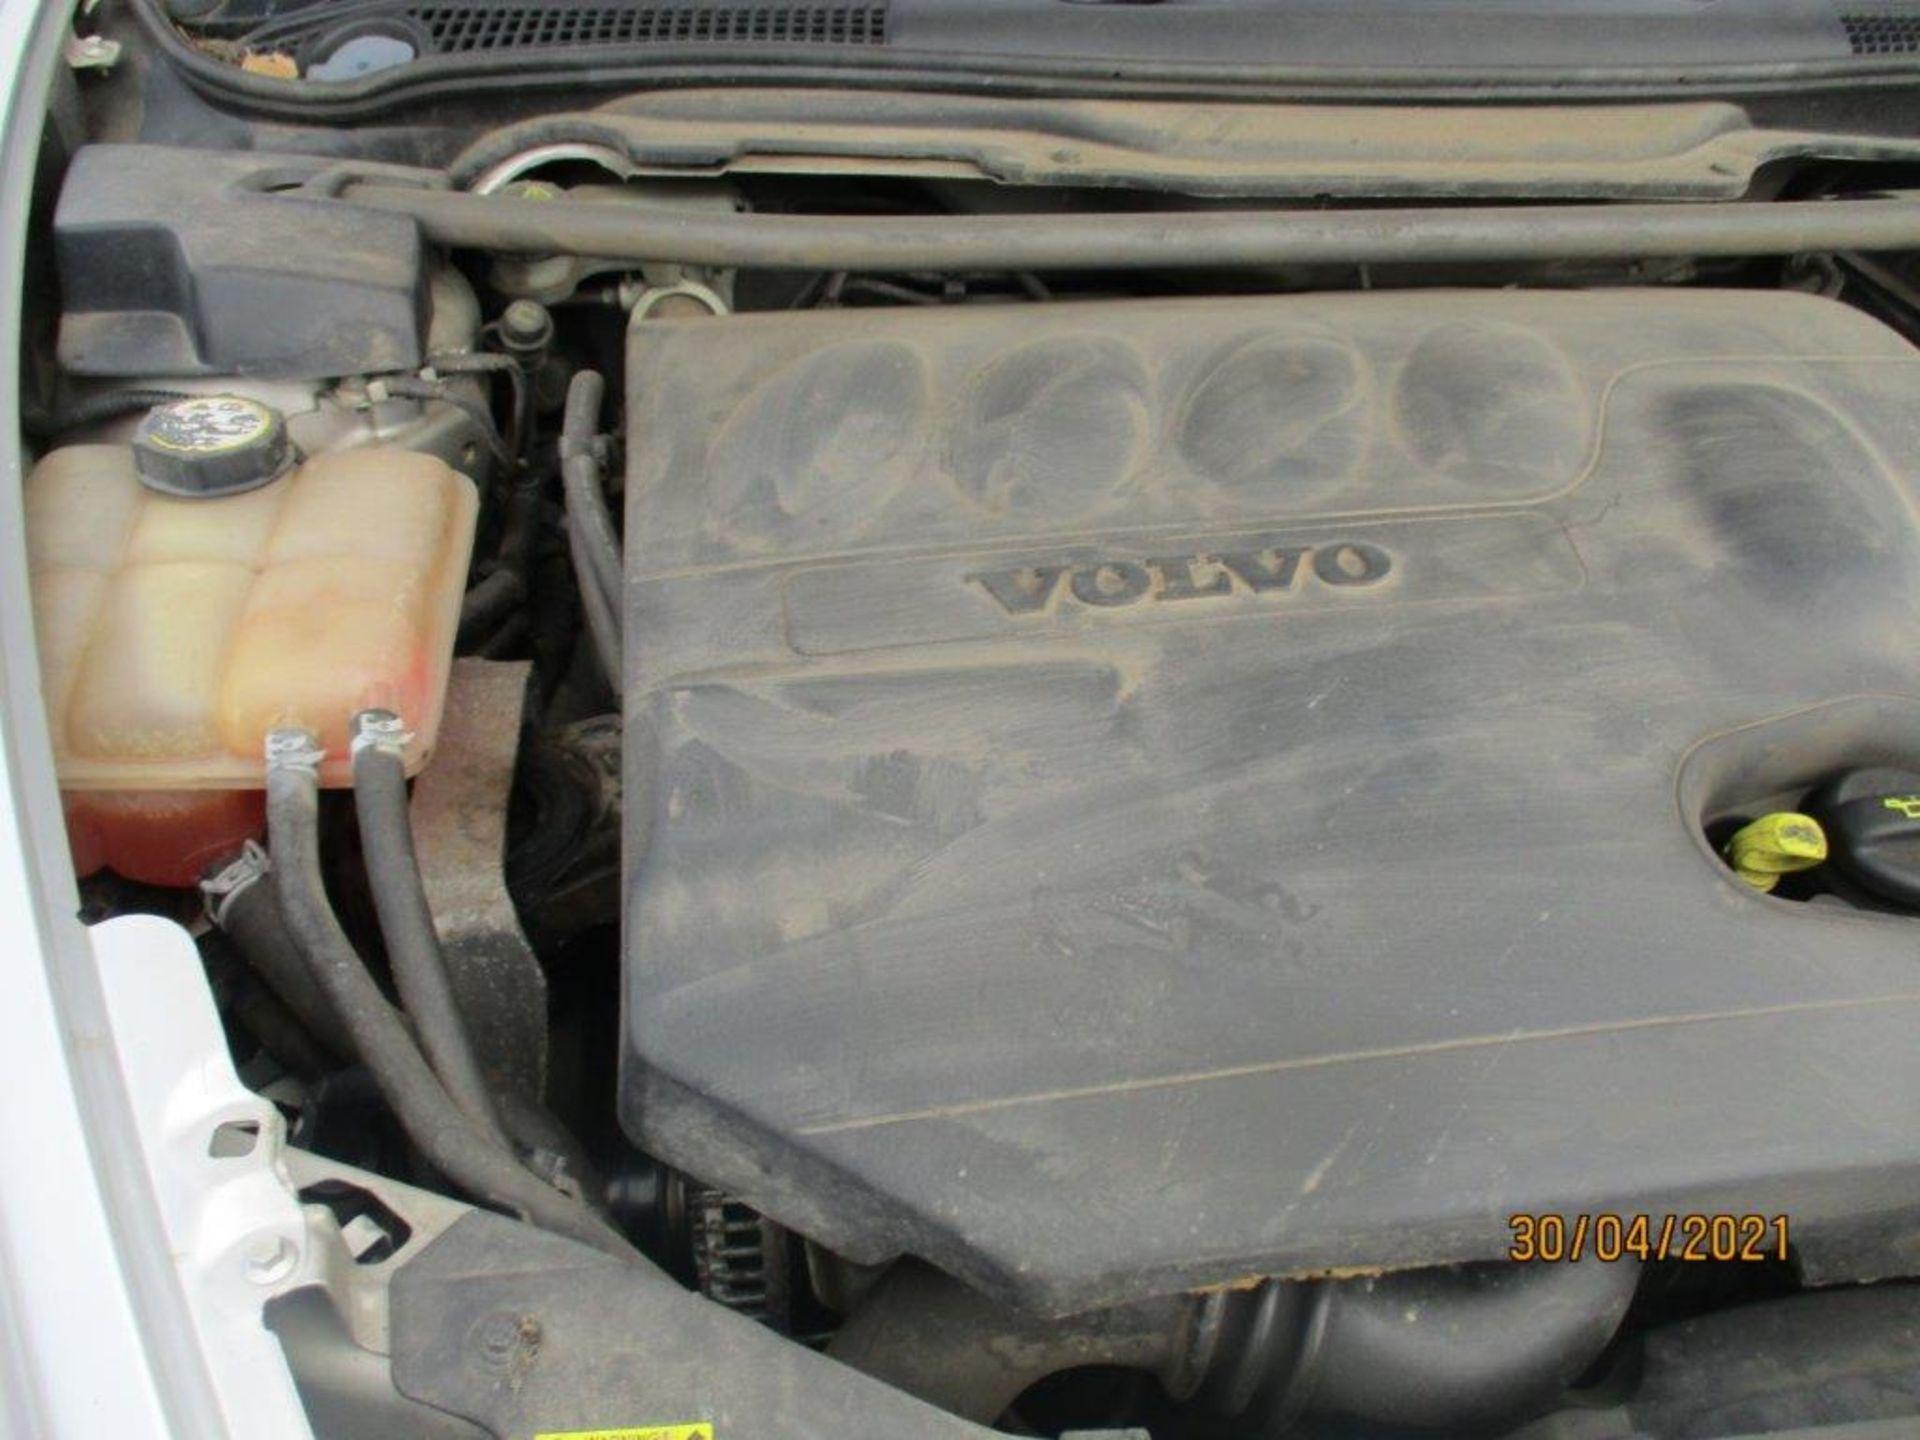 06 06 Volvo V50 SE D (E4) Est - Image 24 of 26